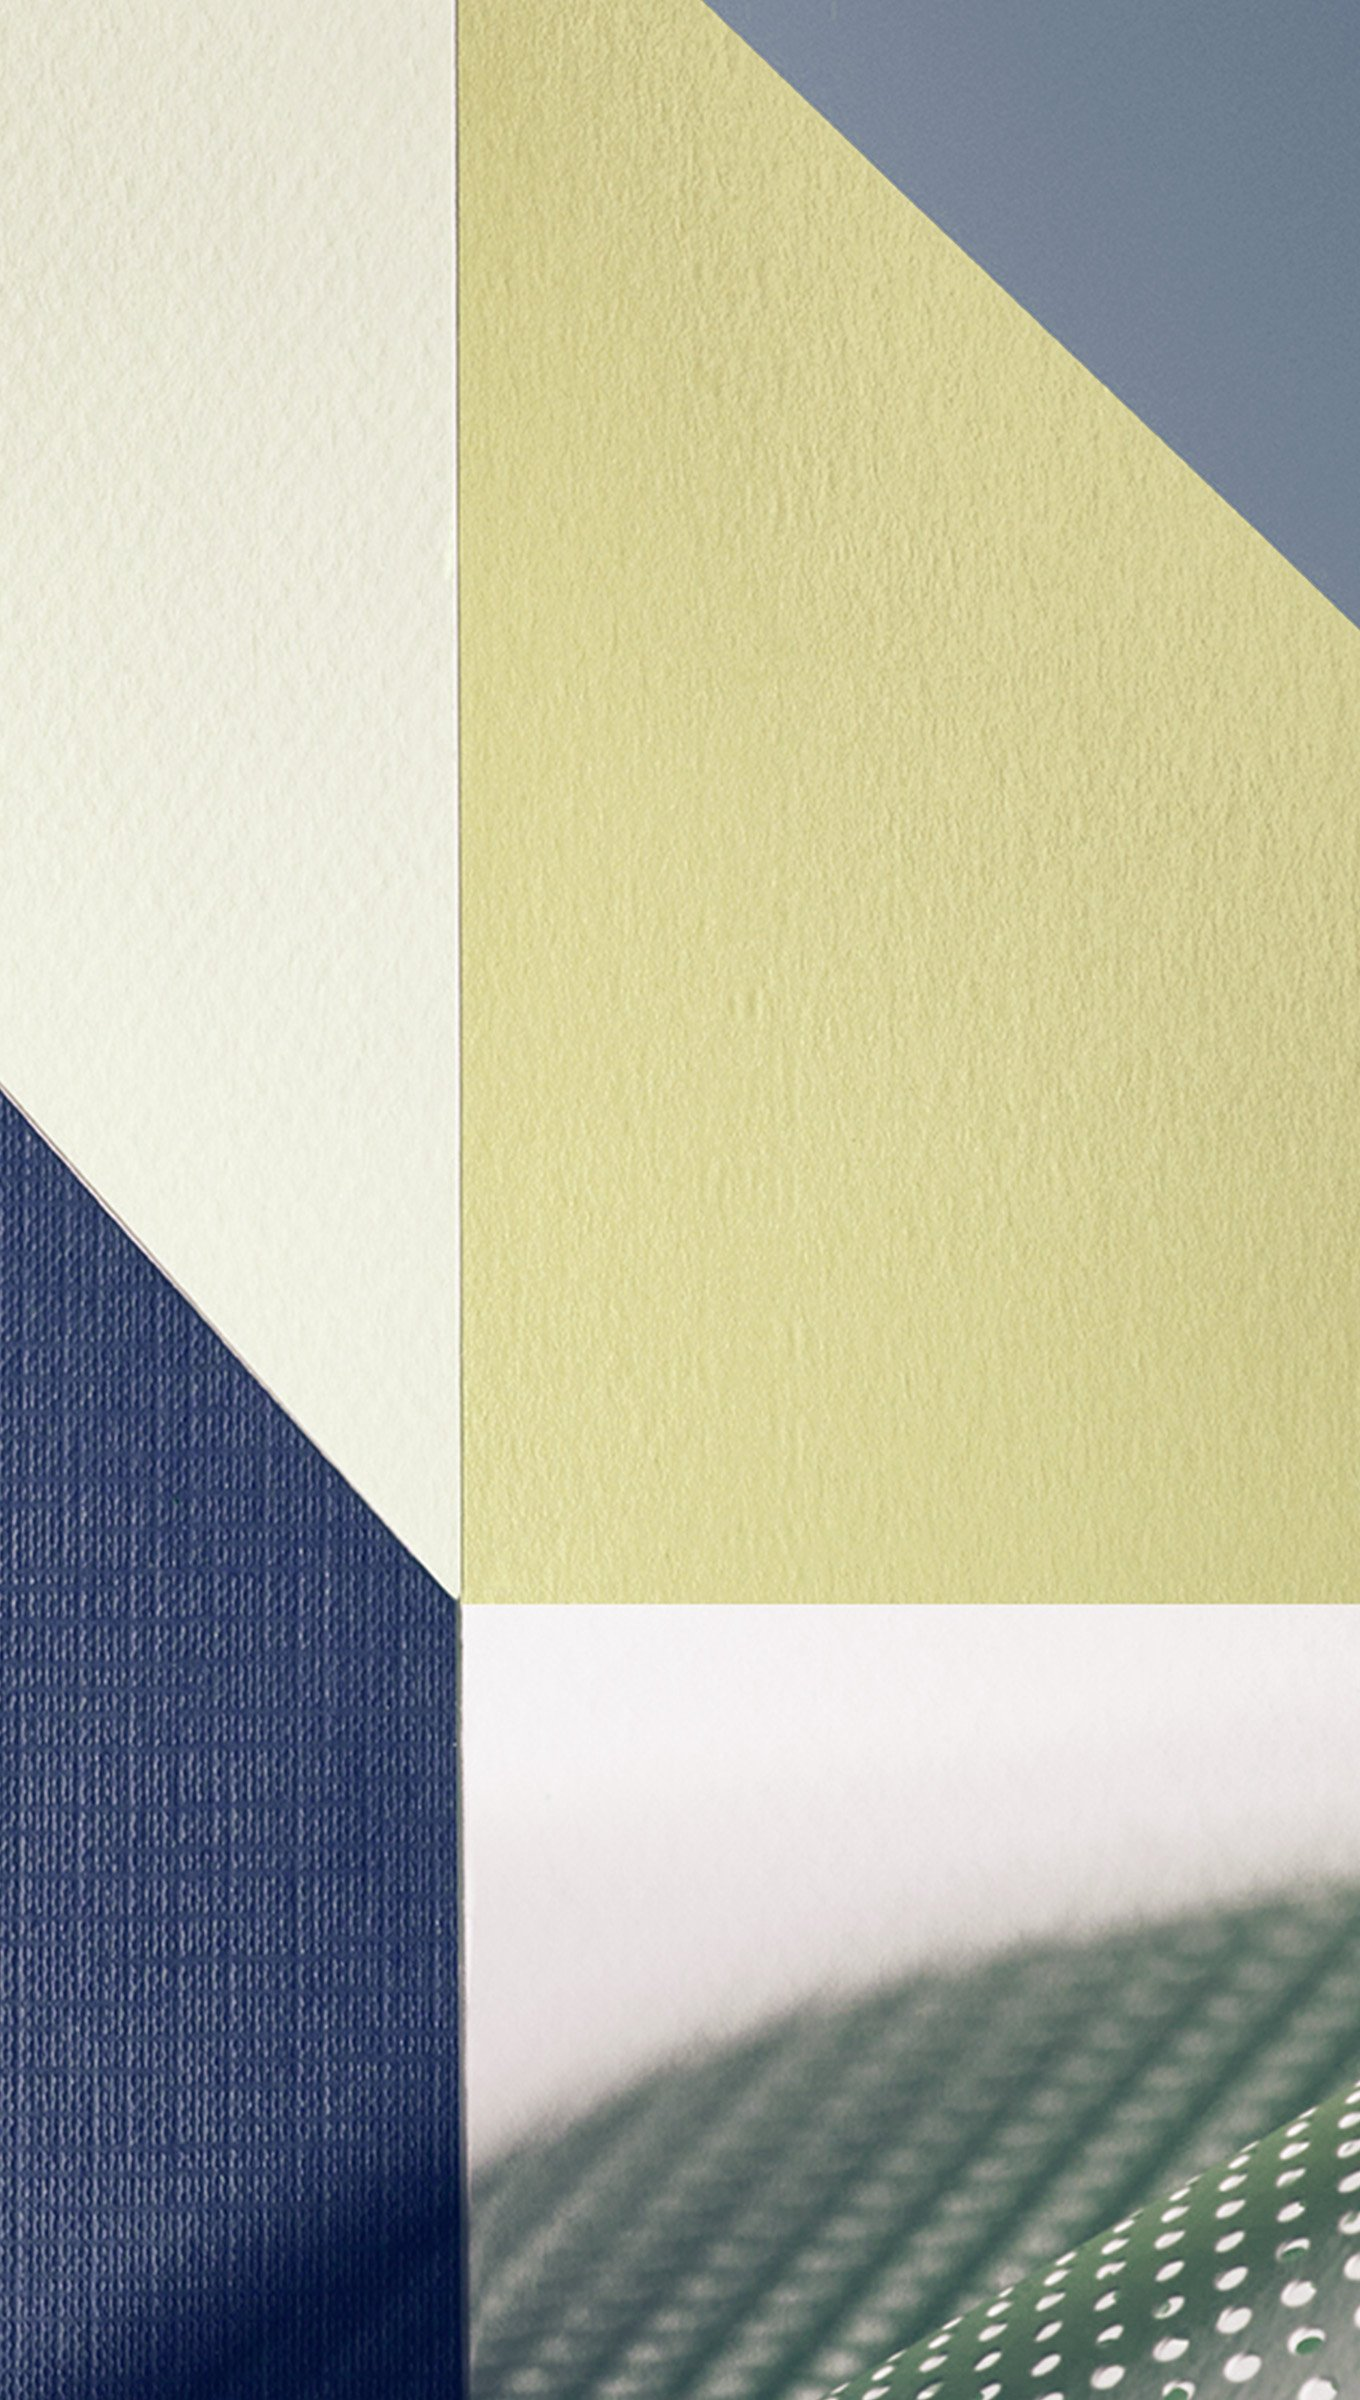 Wallpaper Illustration textures Vertical